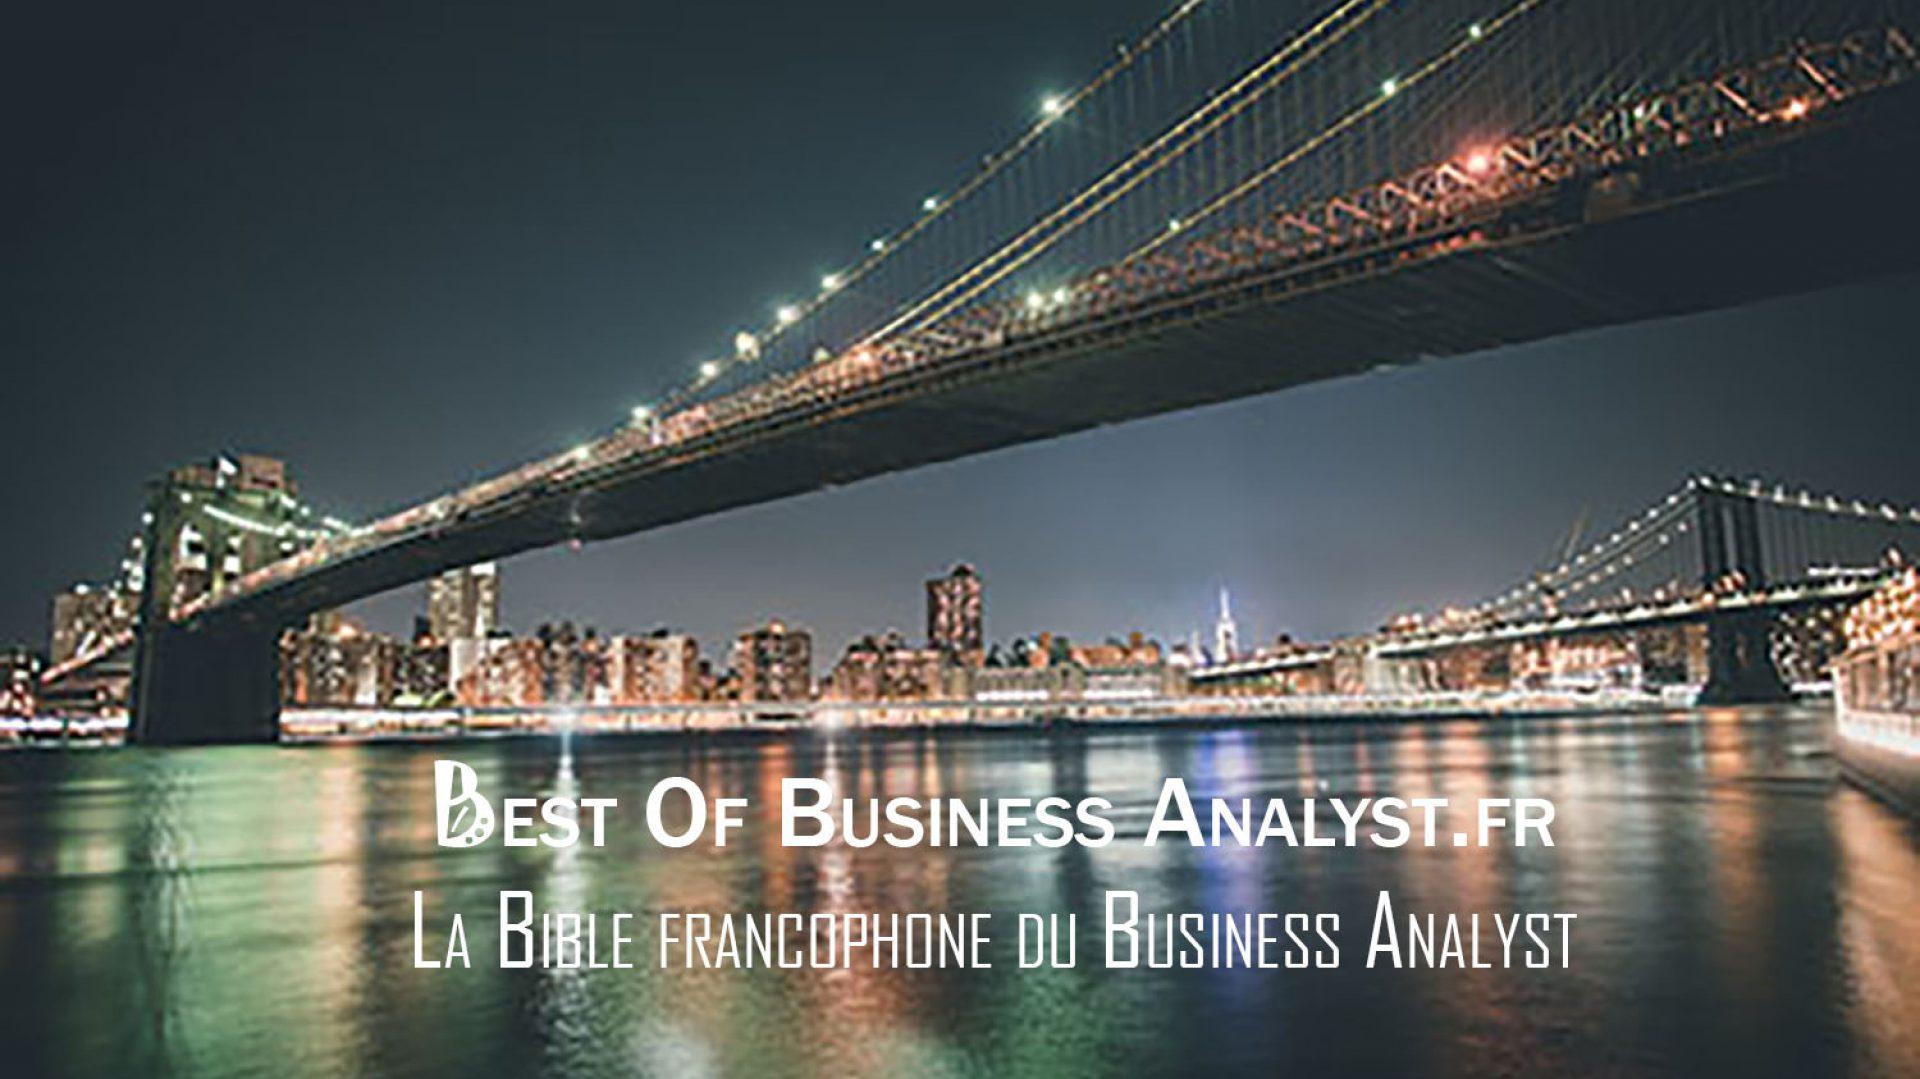 bestofbusinessanalyst.fr